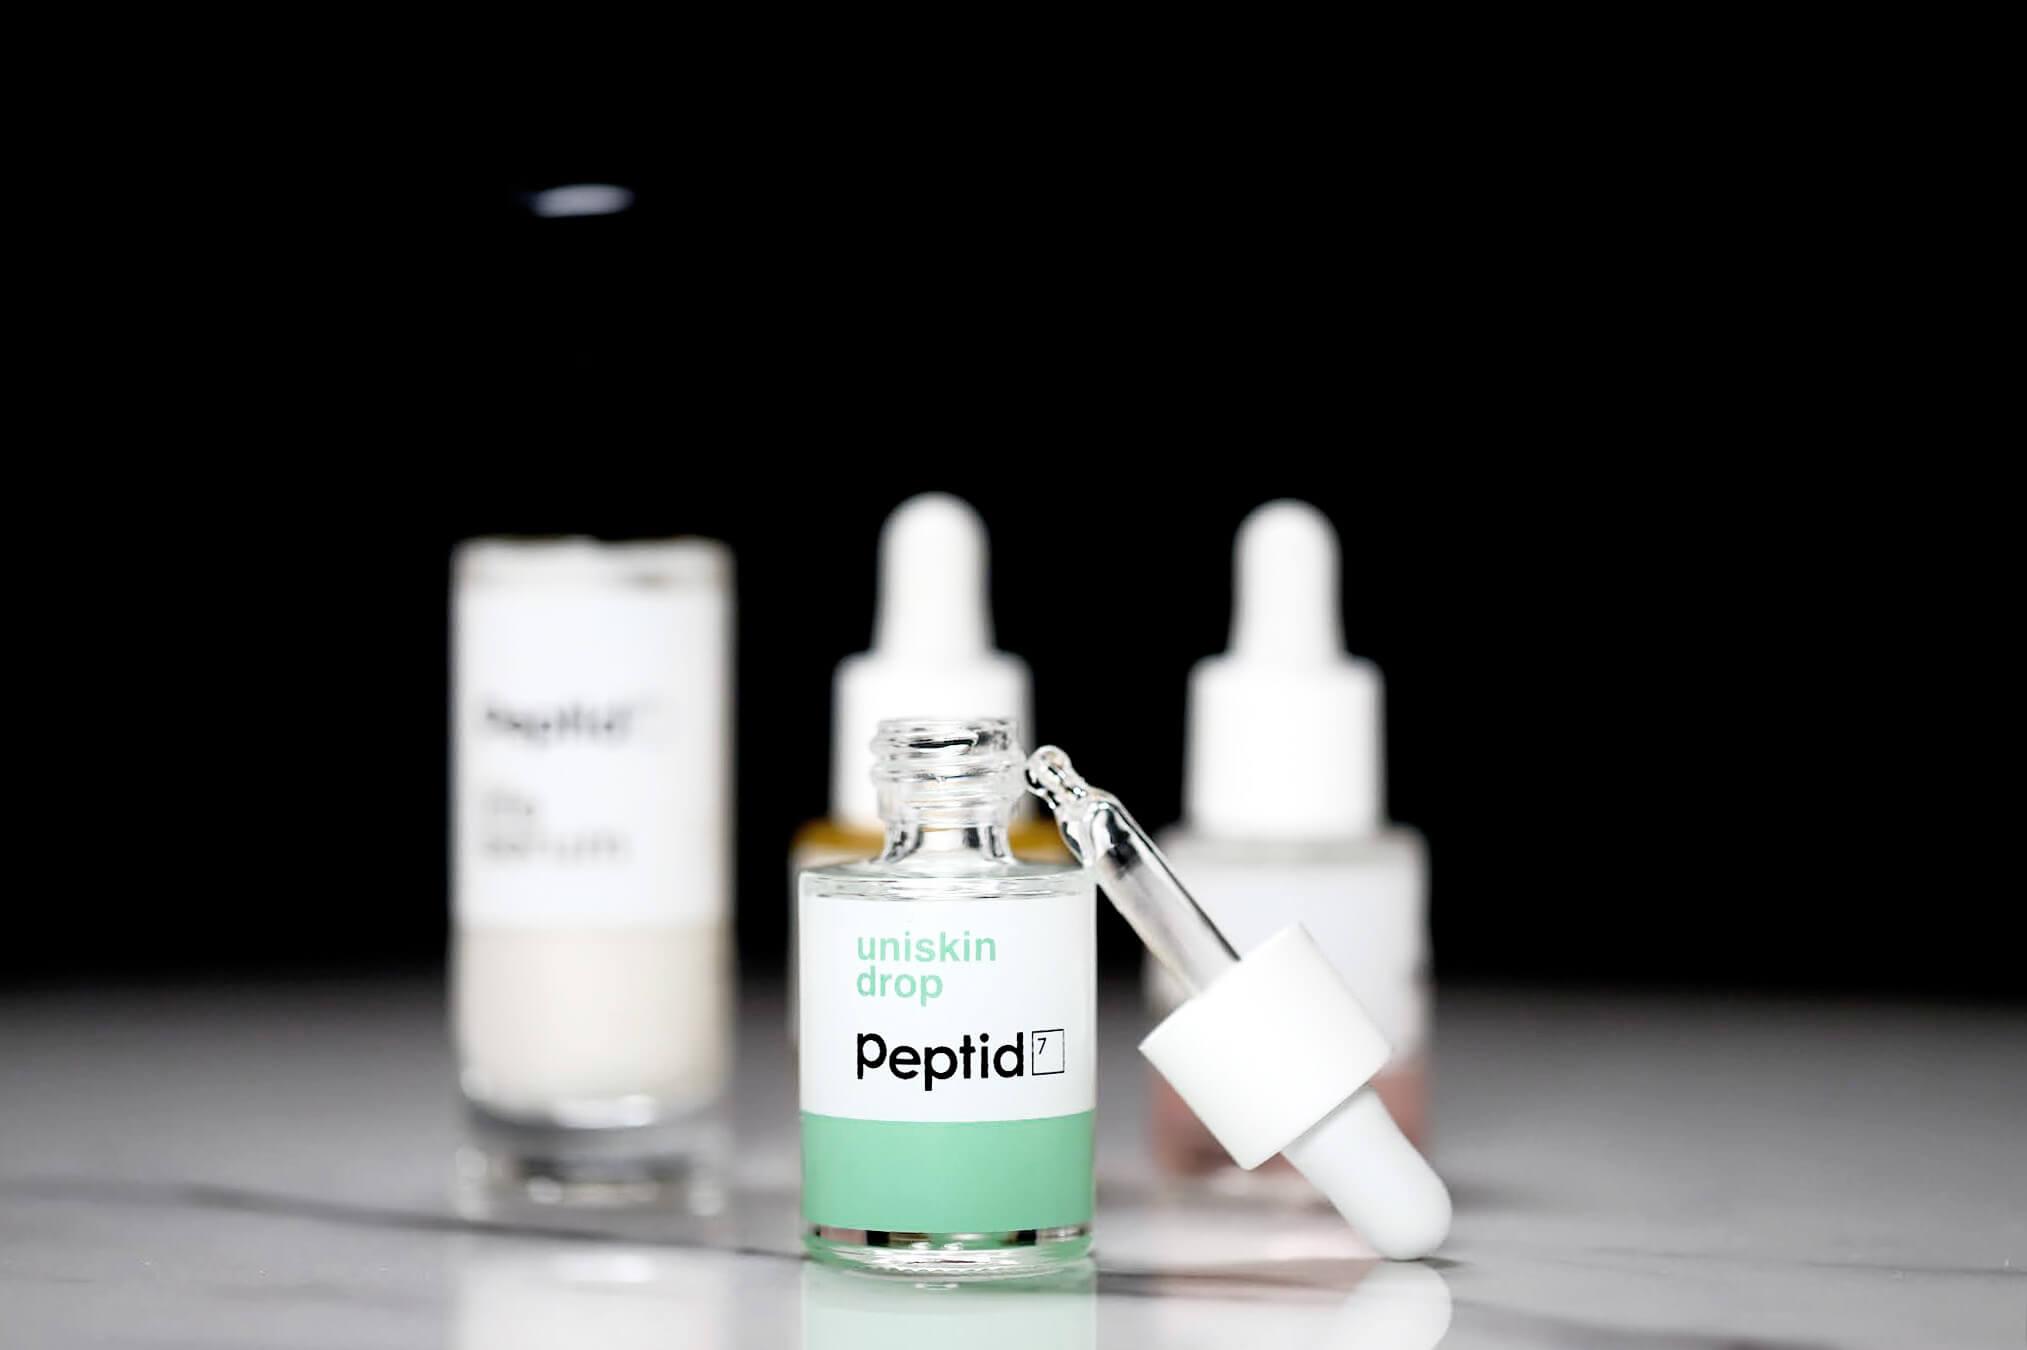 Peptid7 drop uniskin